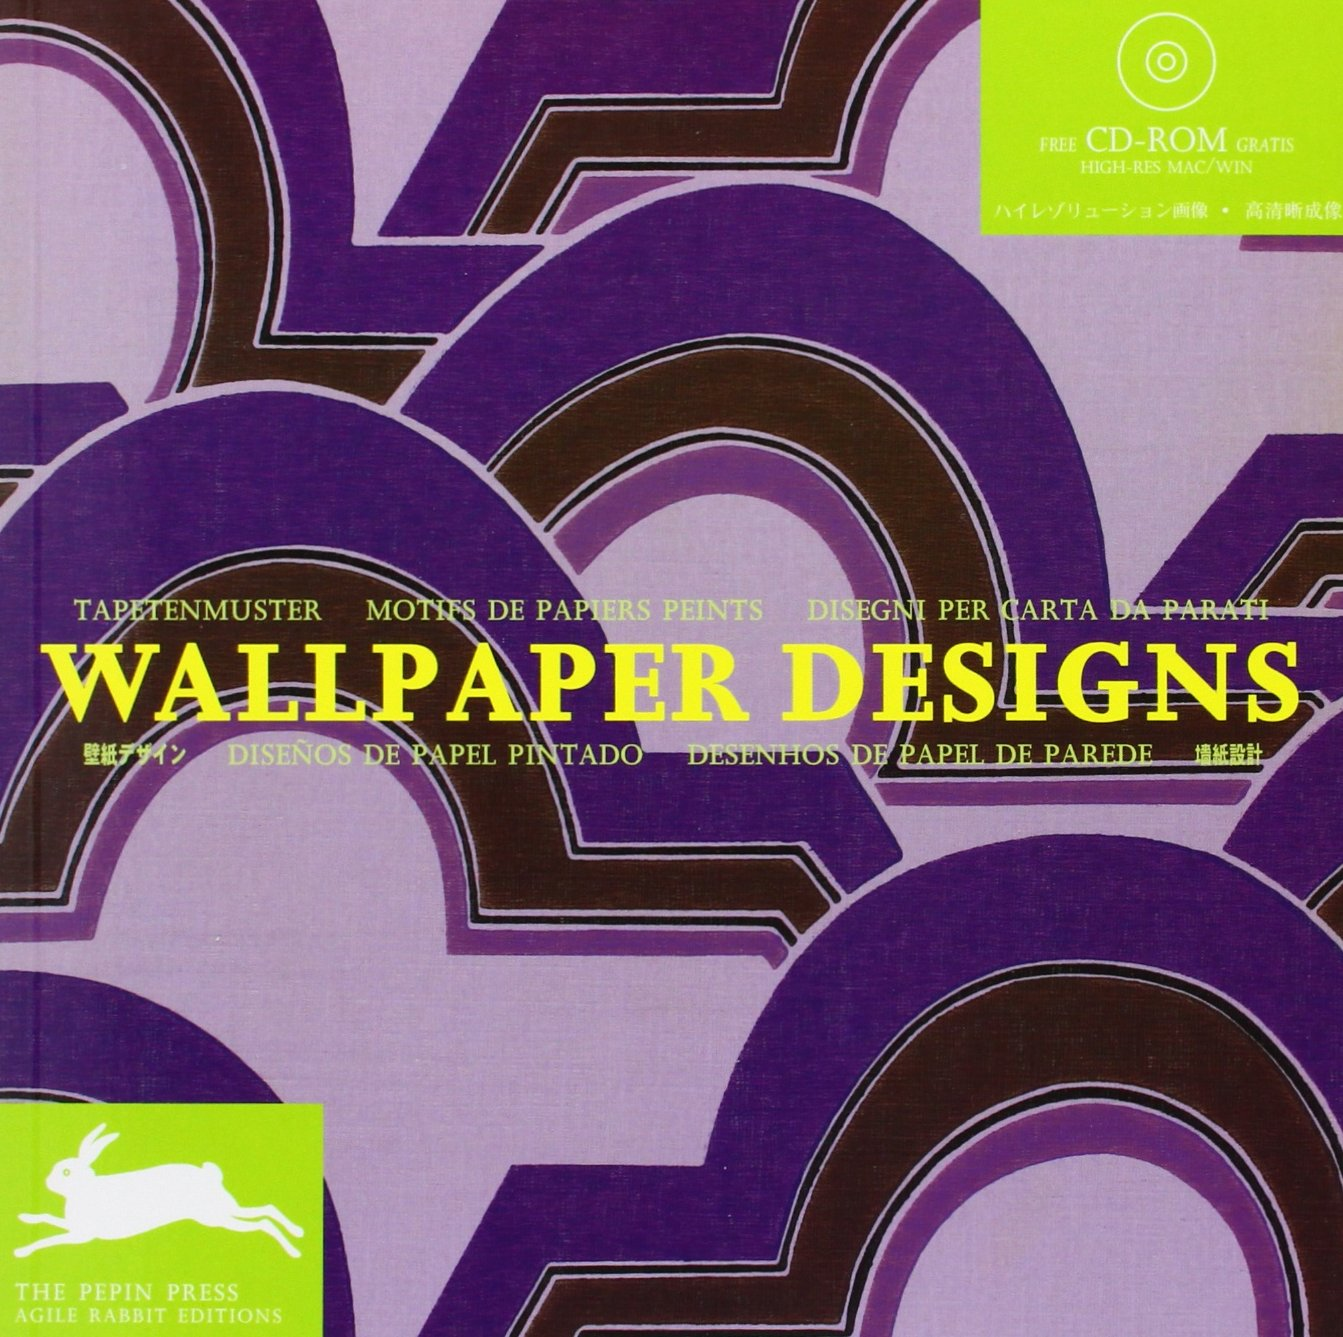 Wallpaper Design (Agile Rabbit Editions)